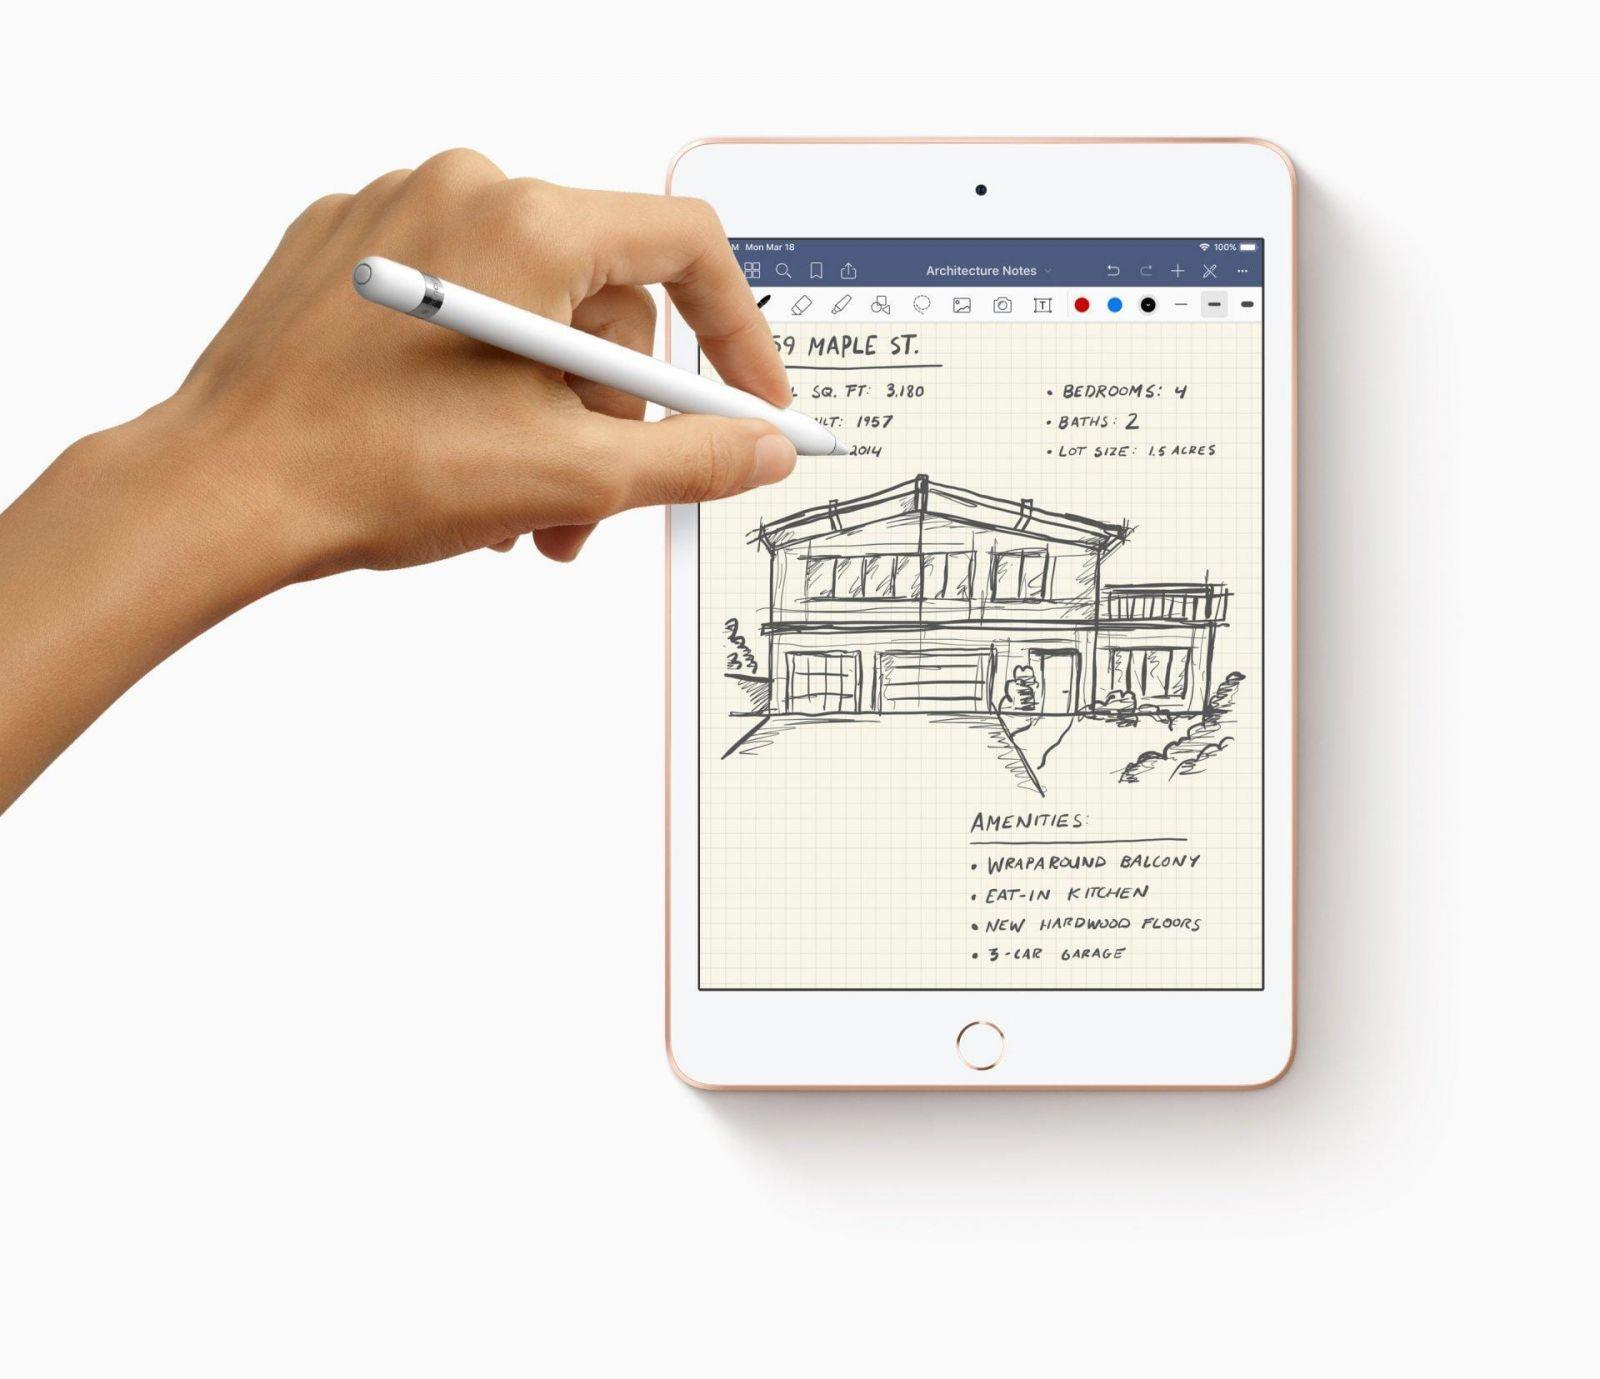 Apple неожиданно представила новый iPad Air и iPad mini c процессором A12 (new ipad mini apple pencil with hands drawing 03162019)